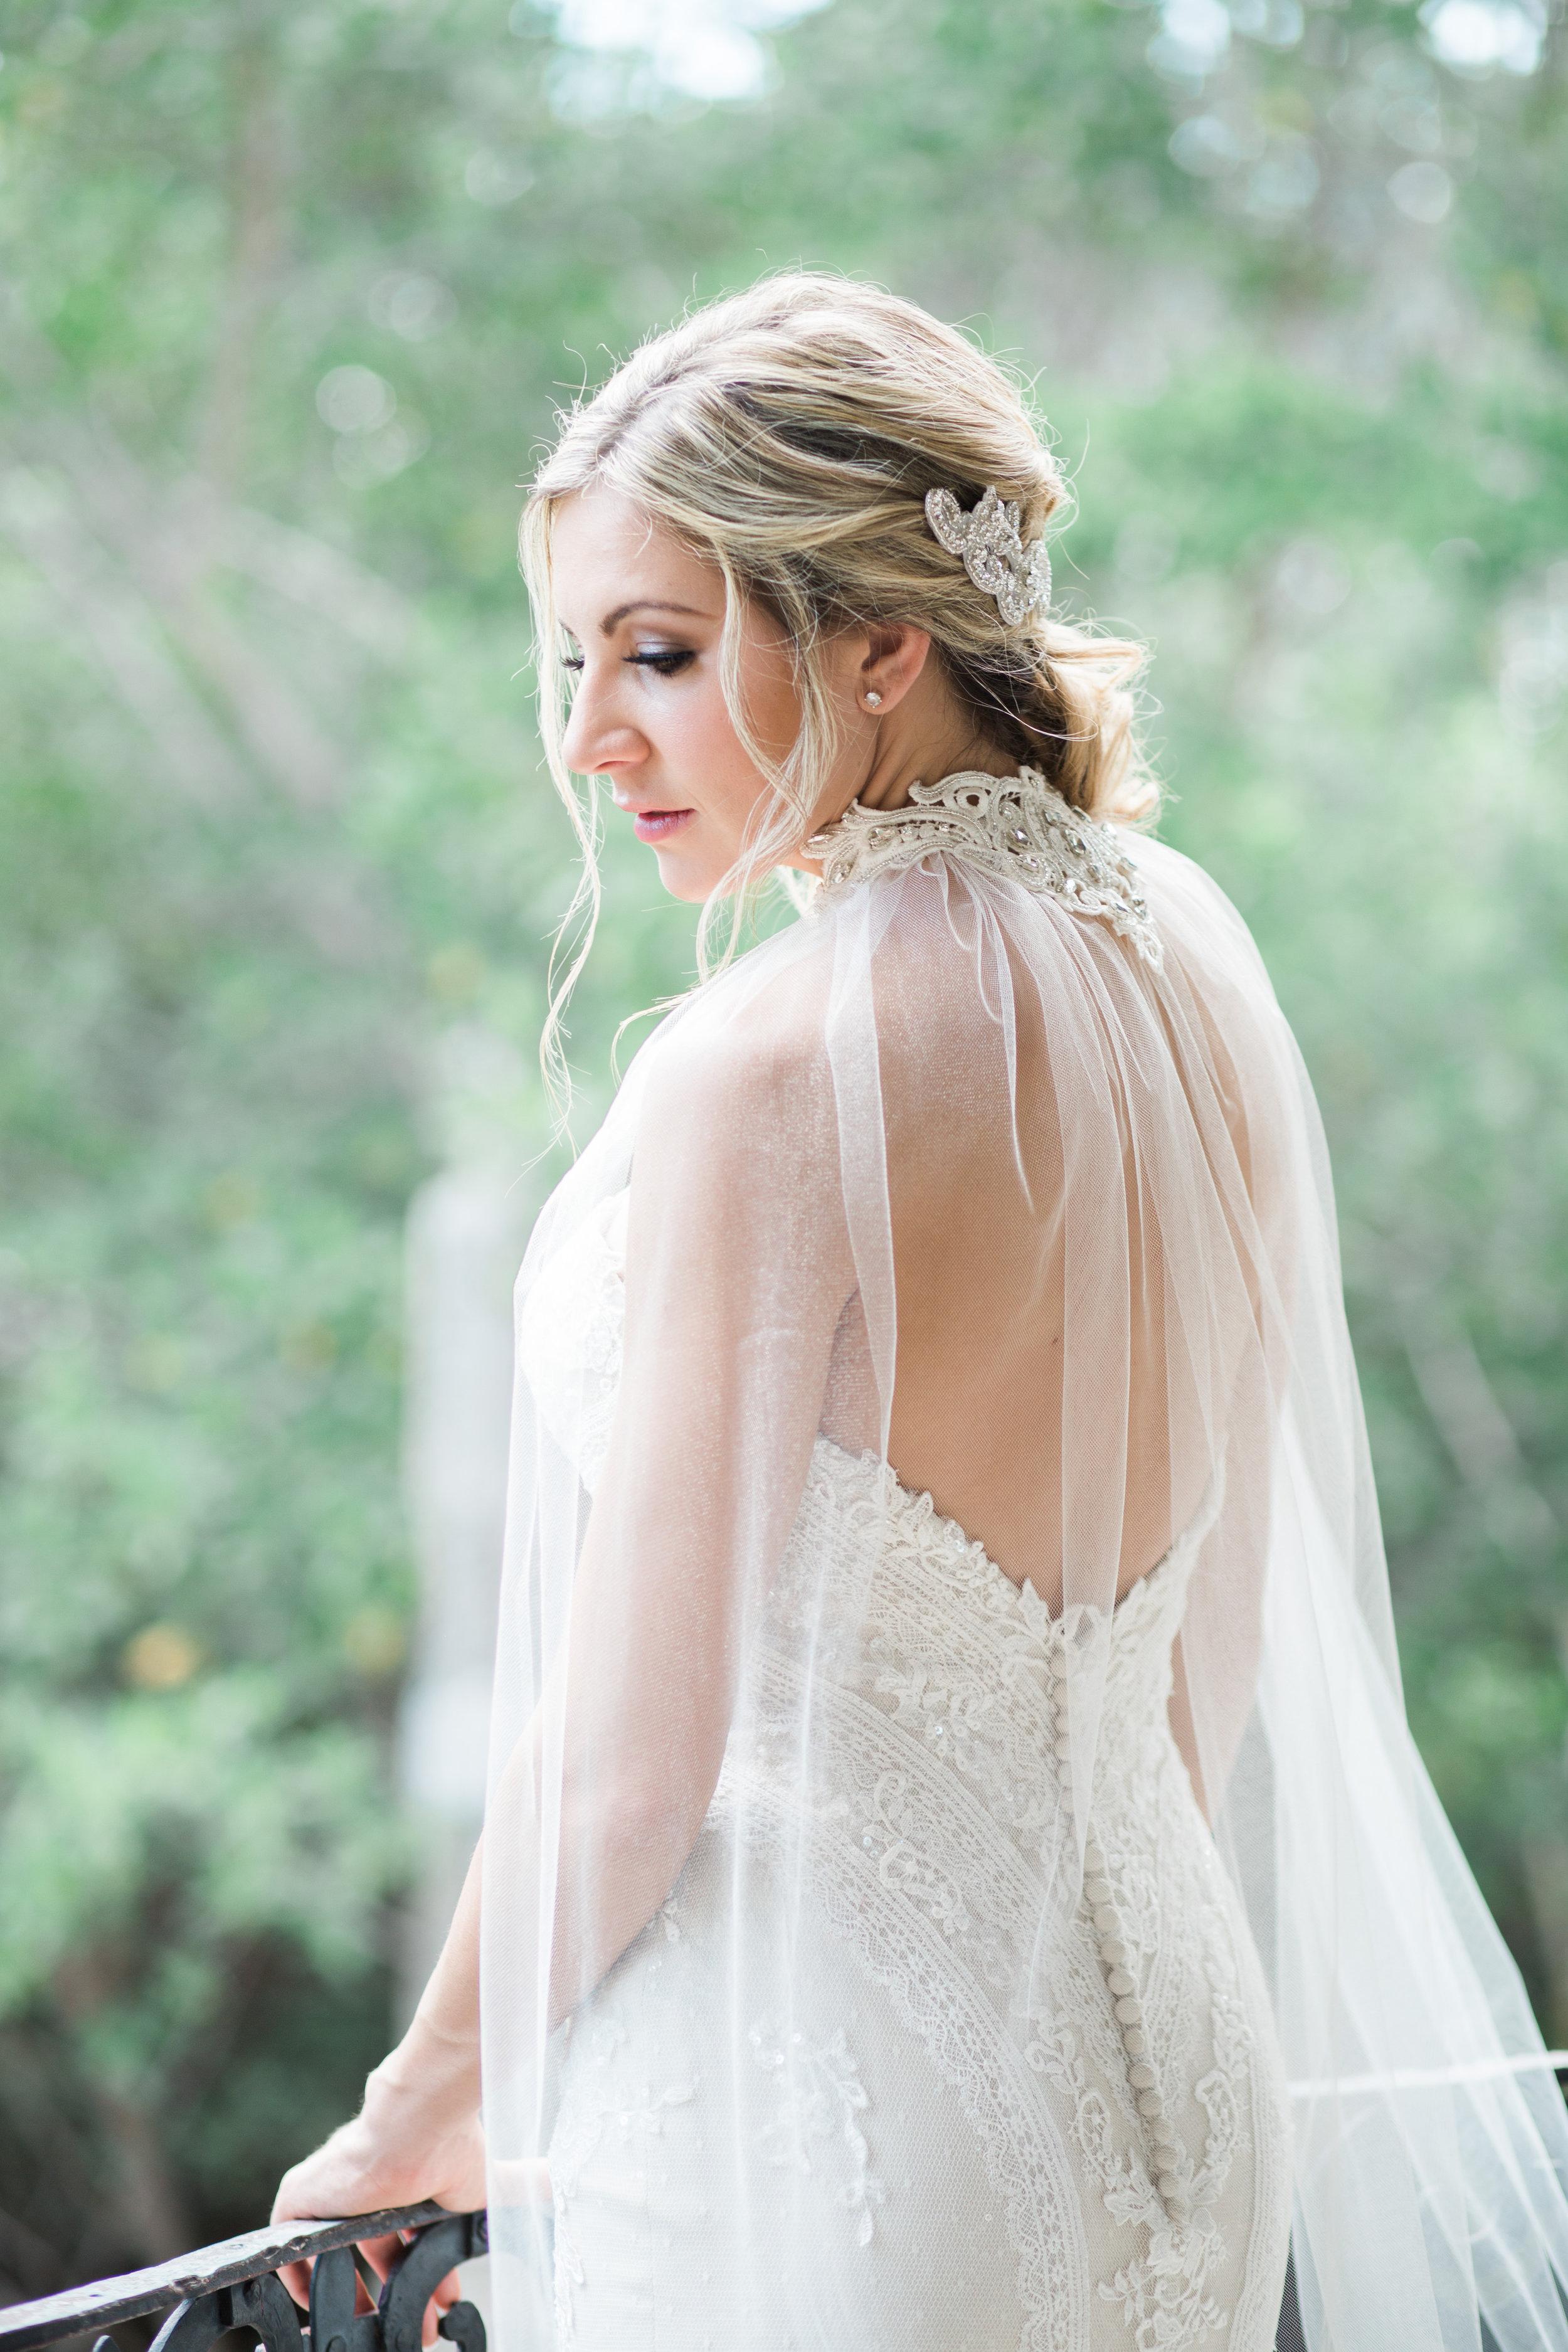 Vizcaya Wedding, South Florida Bride, Bridal Cape, Wedding Cape Veil Champagne and GRIT - Copy.jpg